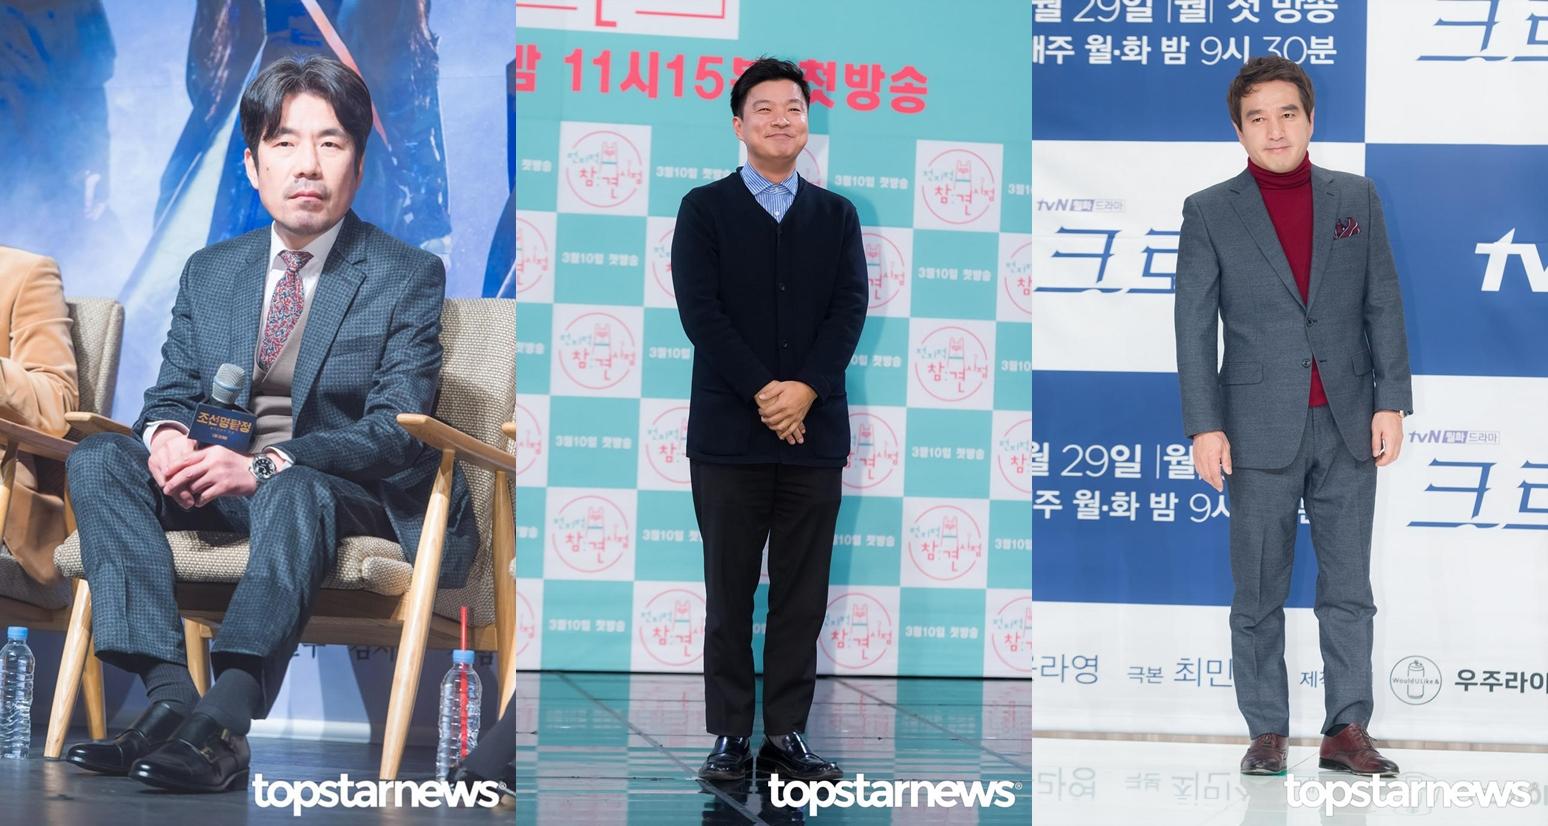 [TOP이슈] 오달수 병원행, 미투 연예인 근황보니…김생민·조재현은 지금